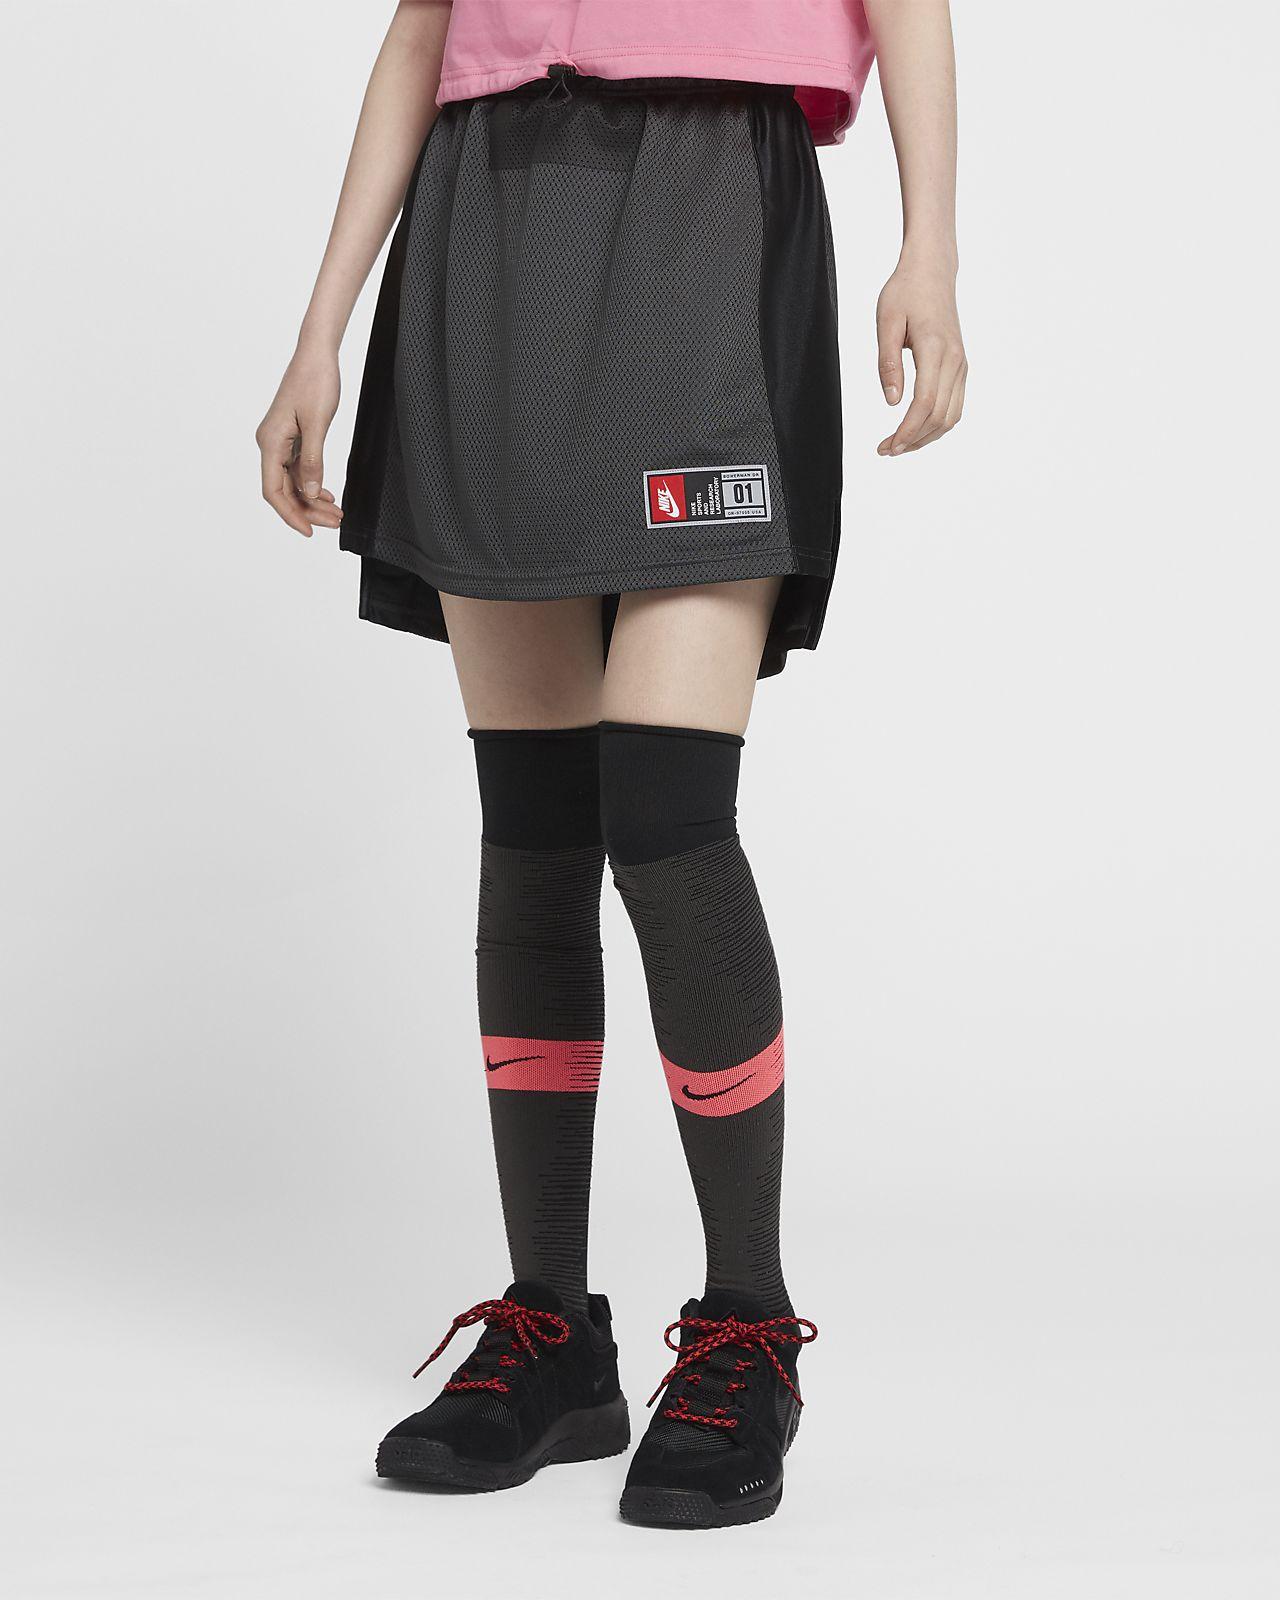 NikeLab Collection női futball-szoknya